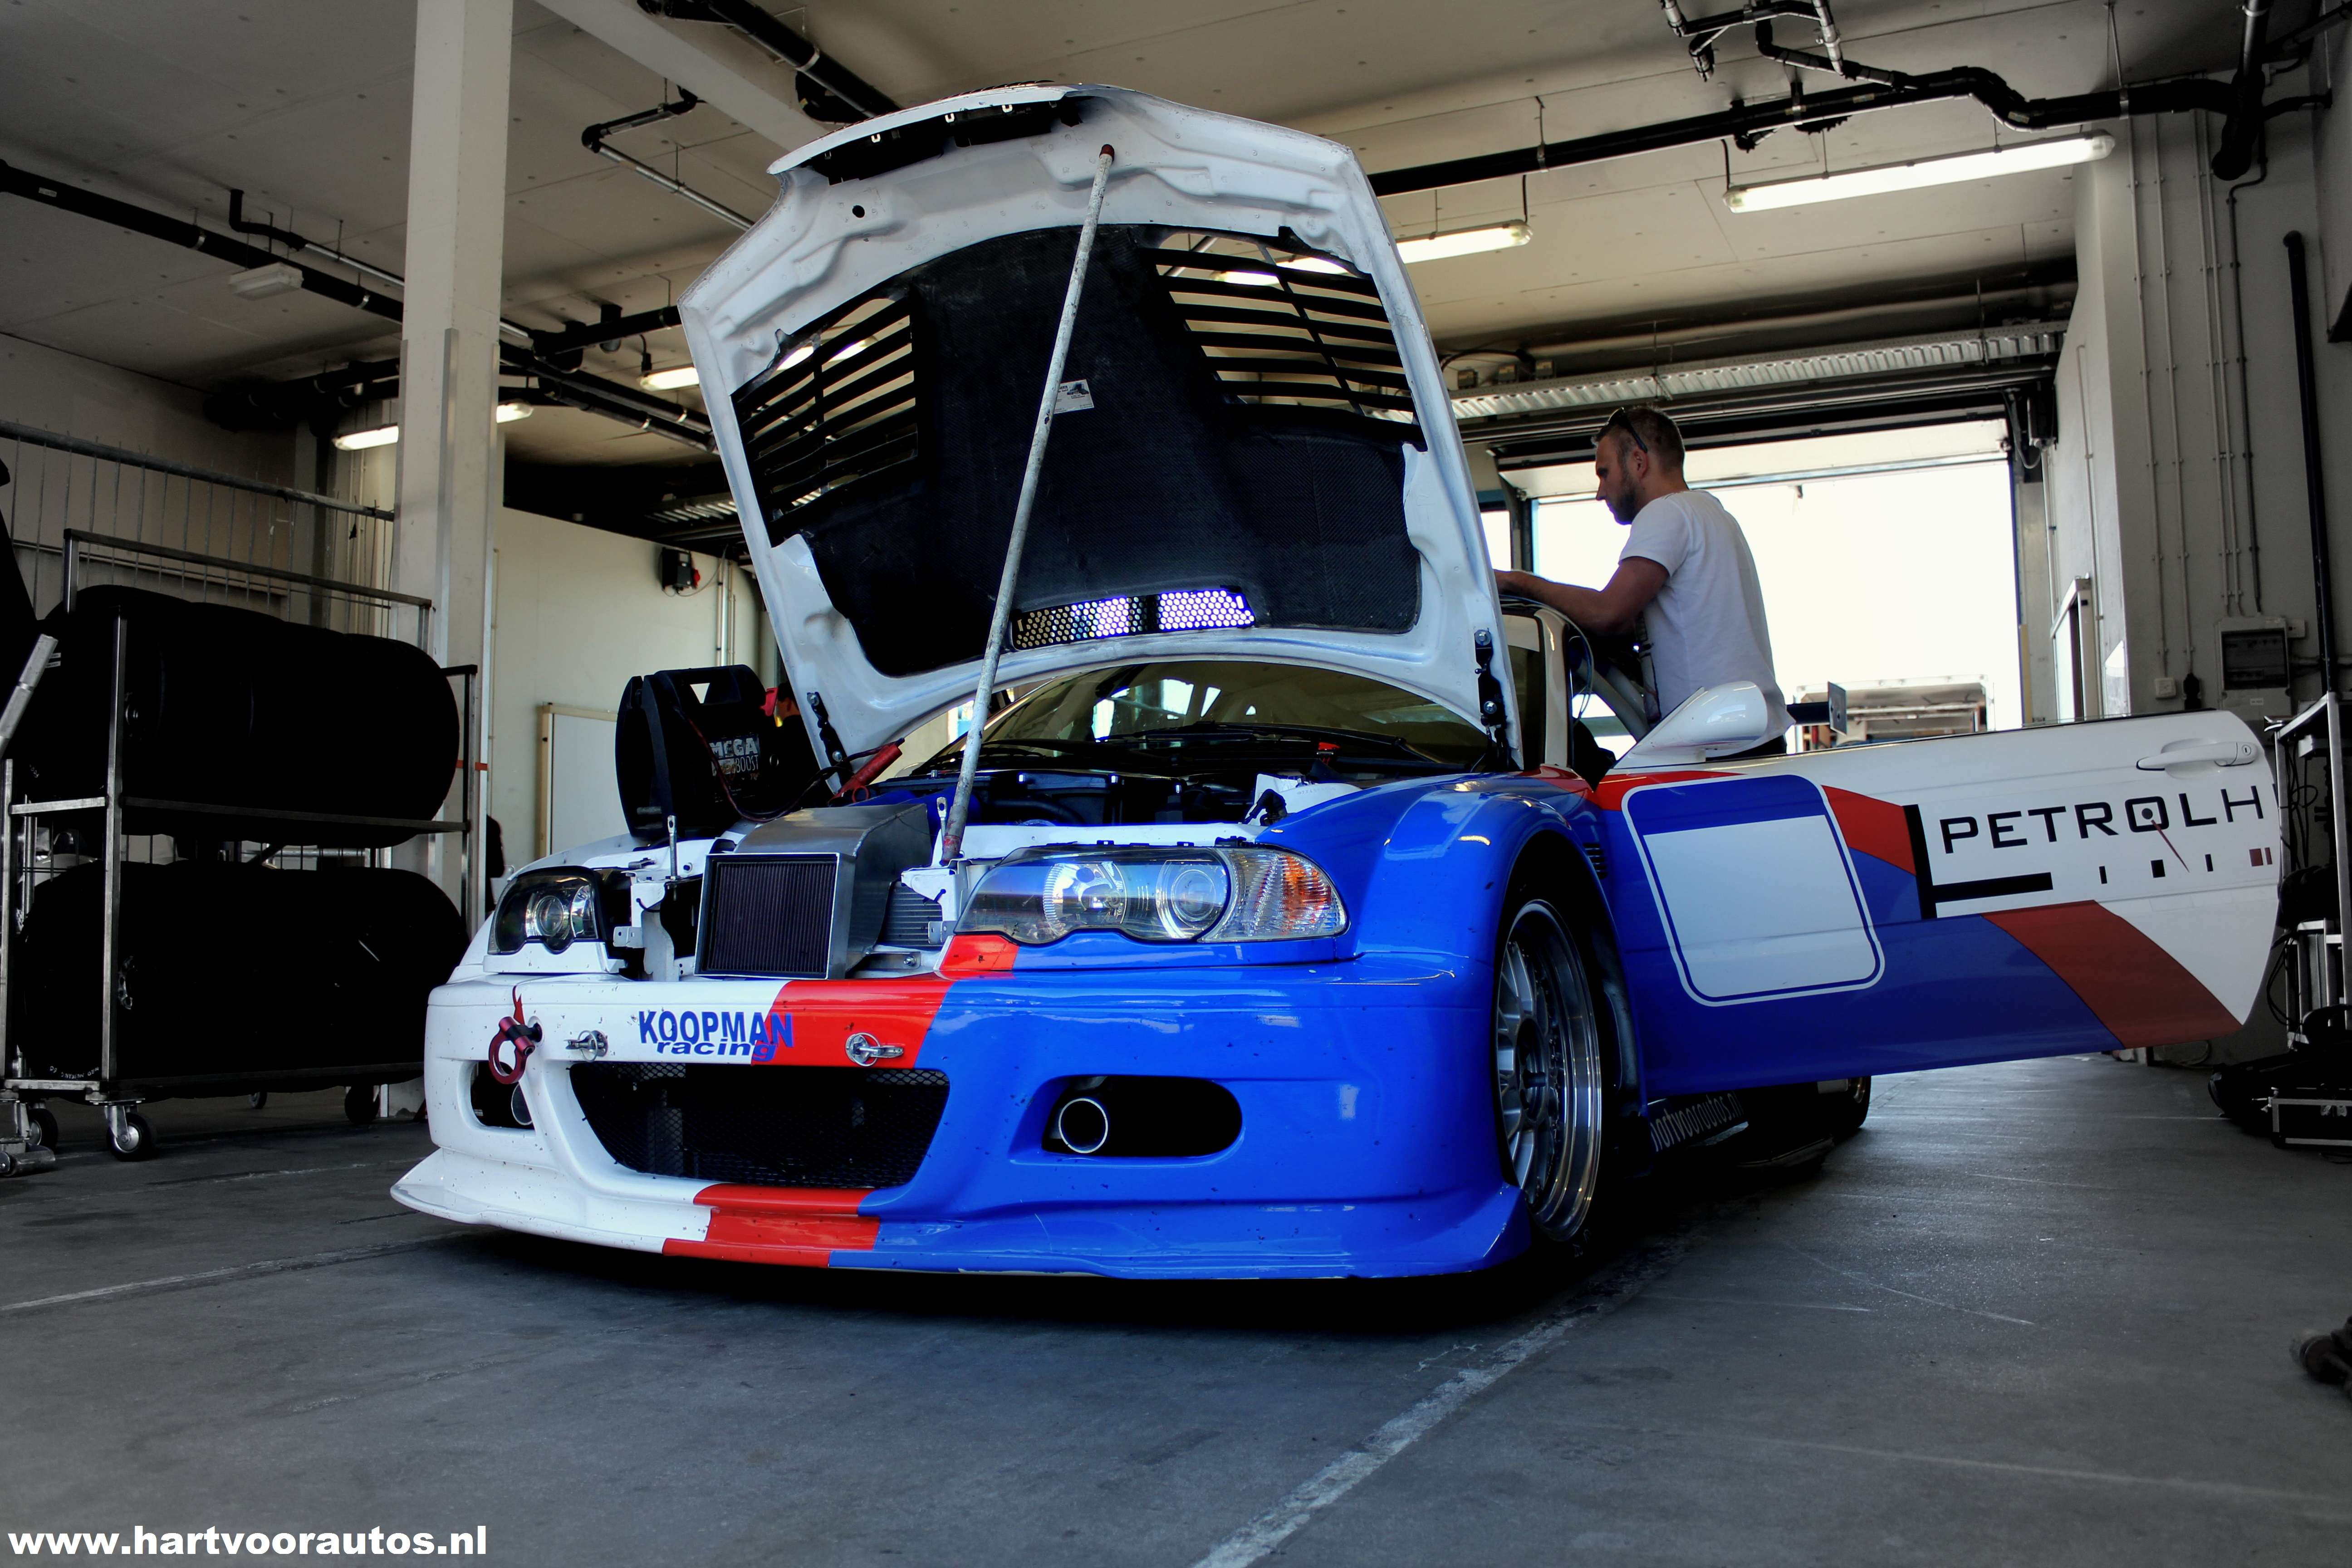 BMW M3 E46 GTR - www.hartvoorautos.nl